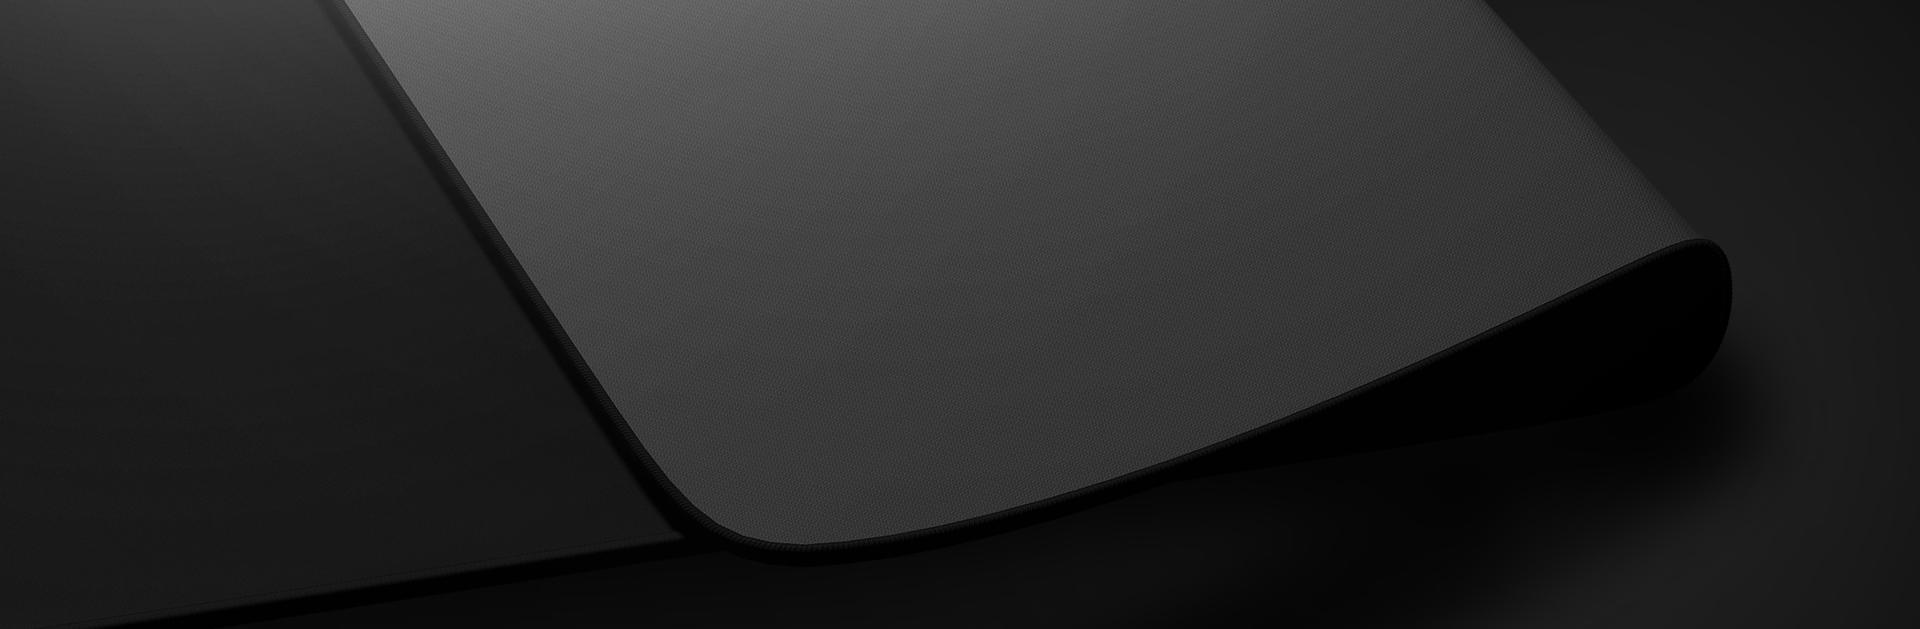 mouse pad genesis carbon 700 700 cordura maxi 900x420 mm 4